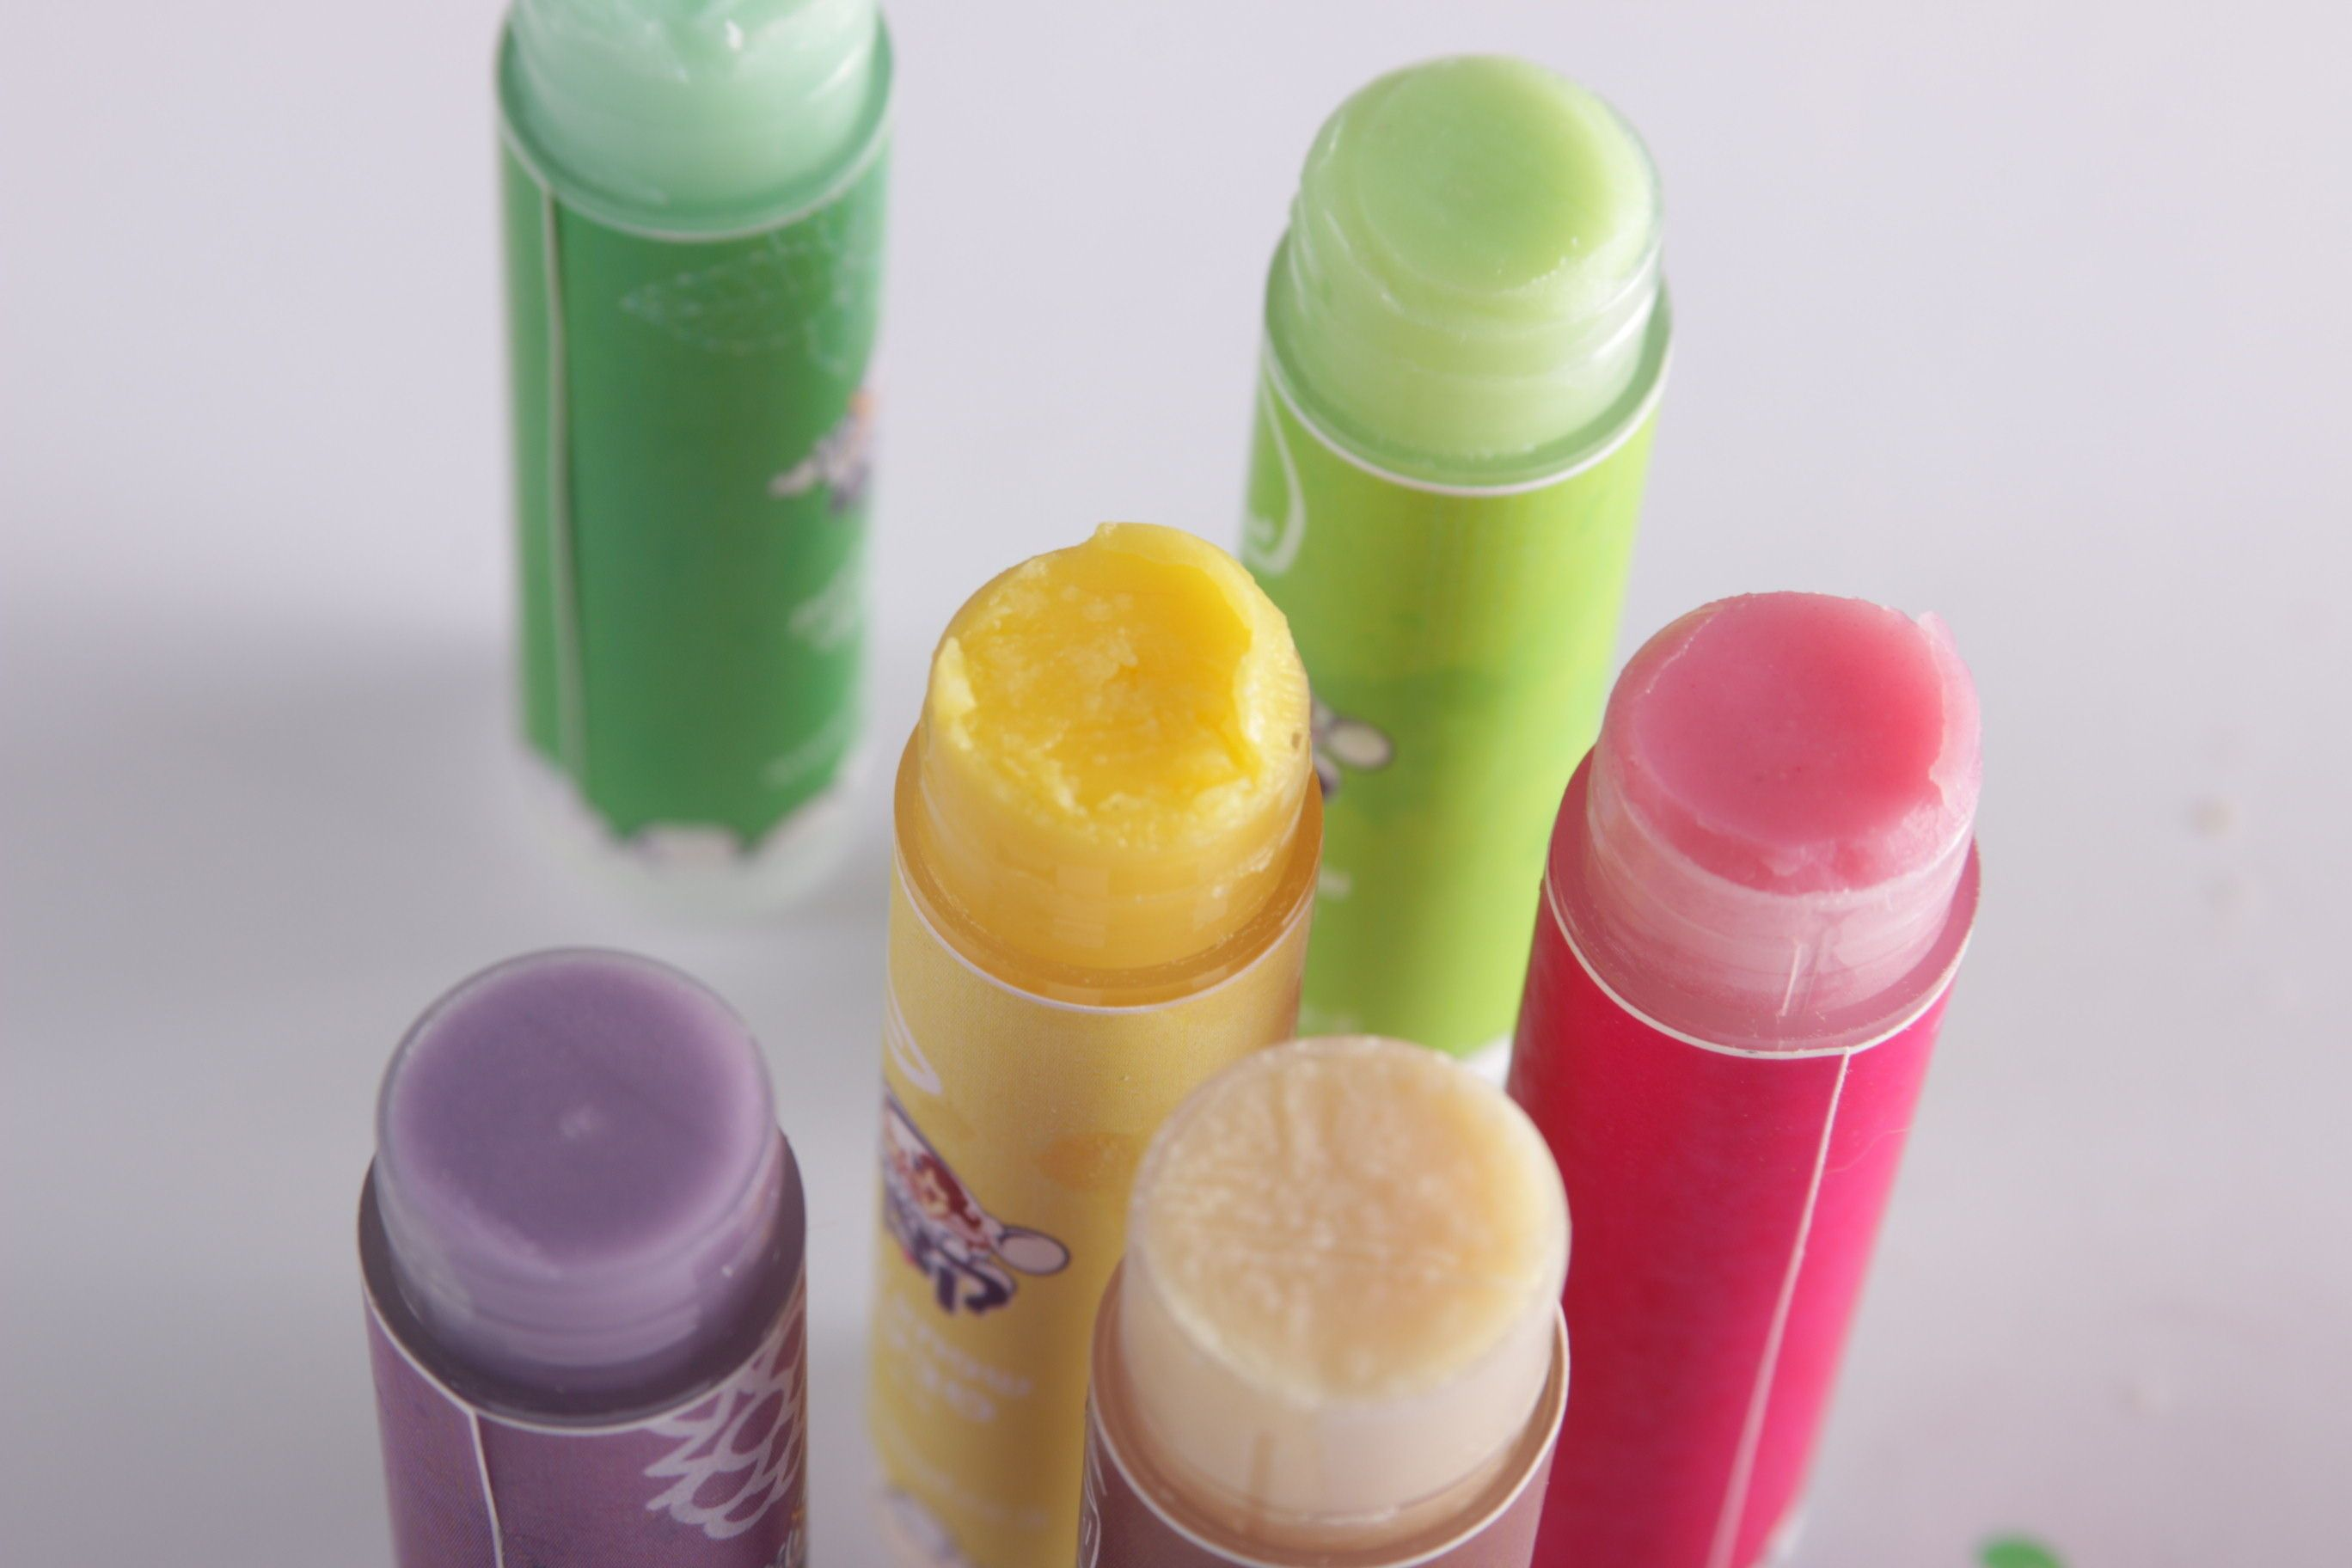 Natural vegan lip balm שפתון לחות טבעי וטבעוני (With